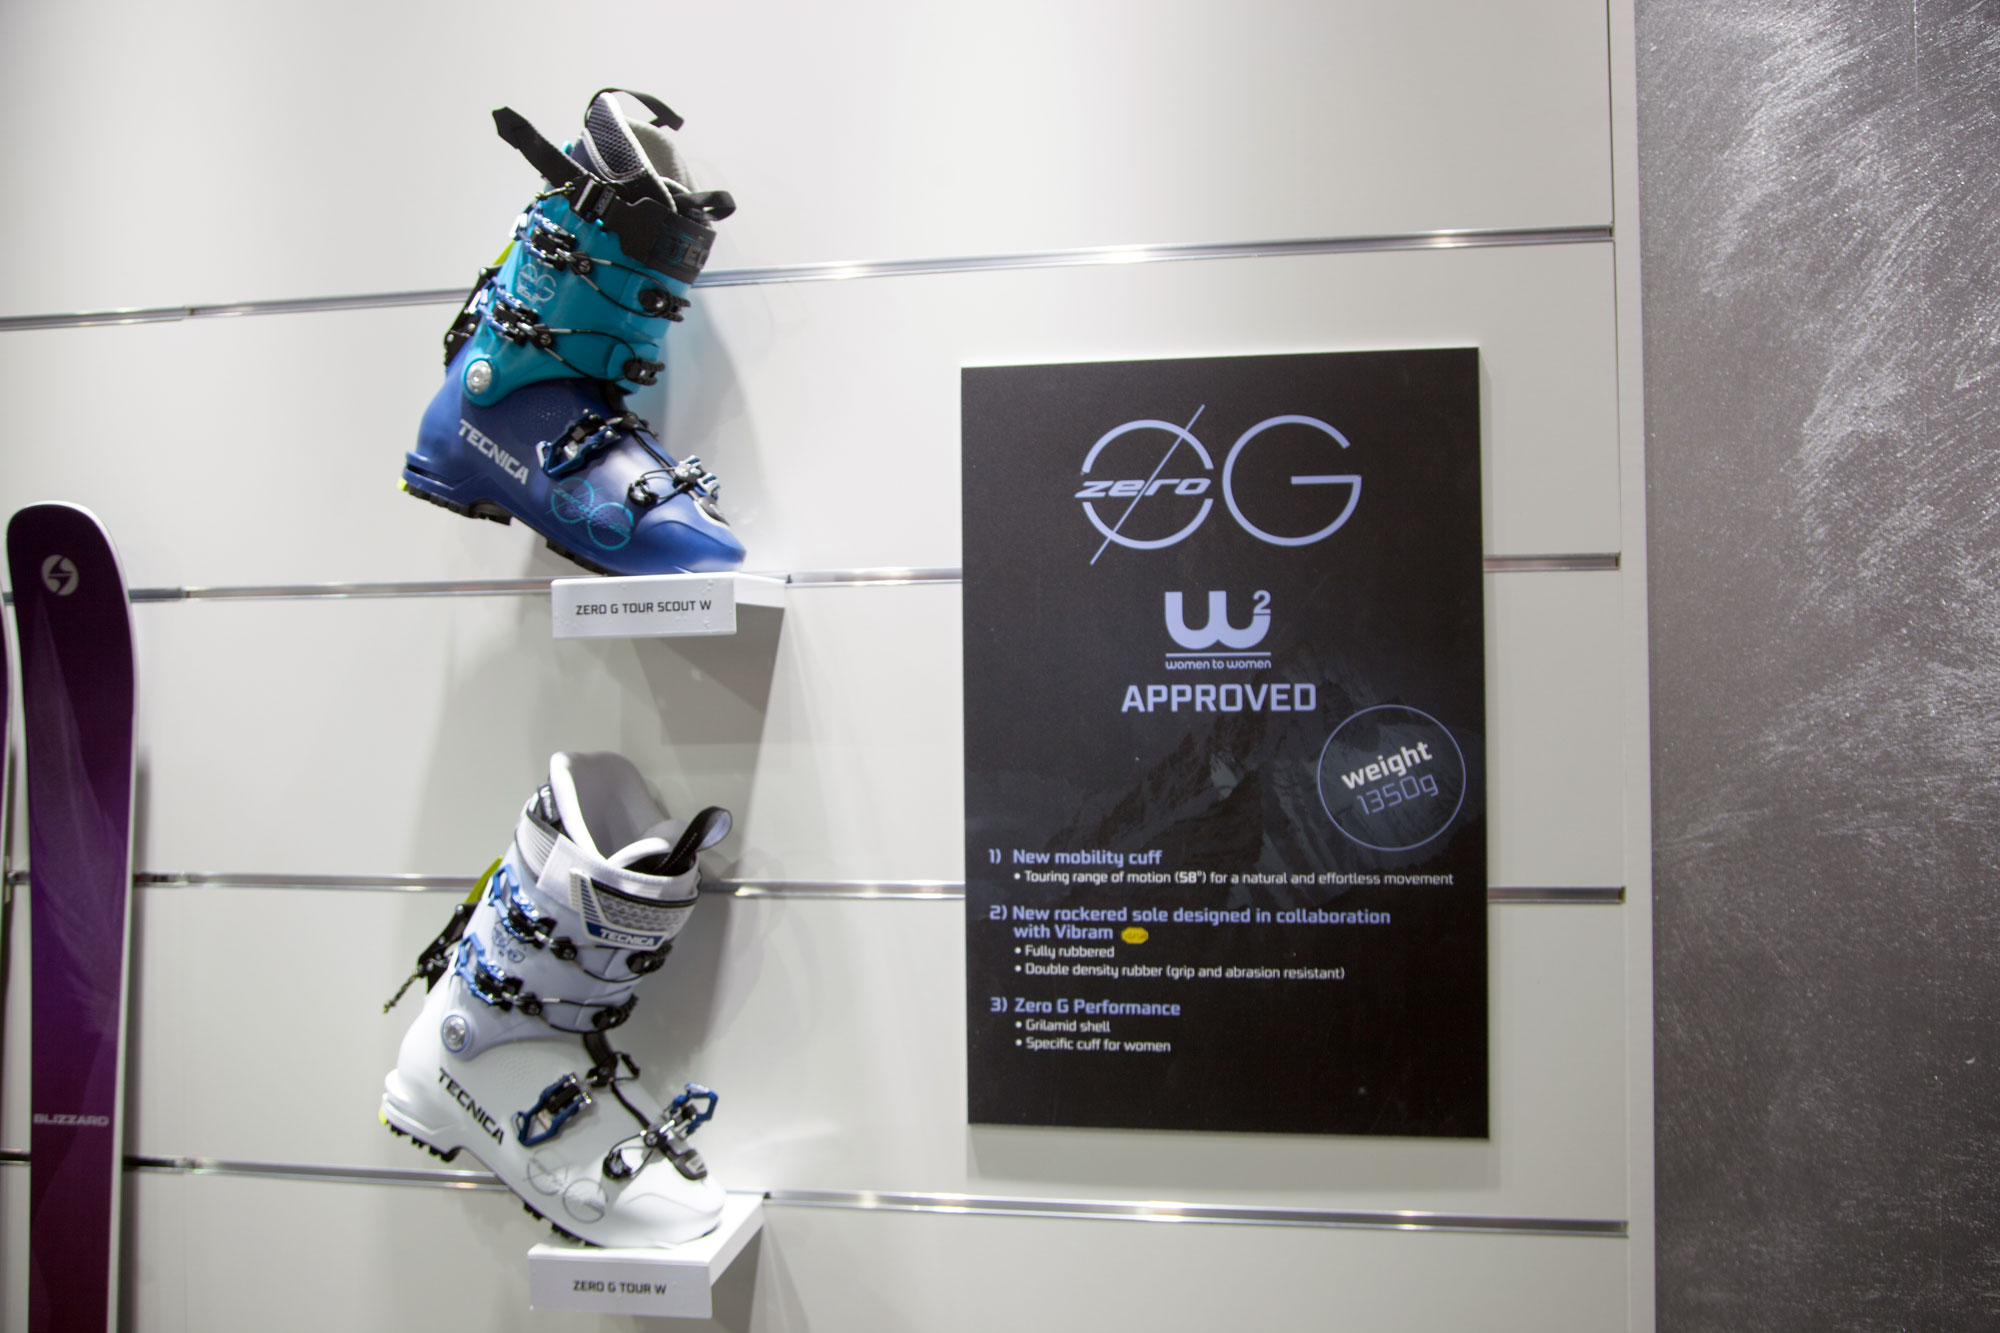 Chaussures Tecnica Skis 2019 Blizzard Ski ZqpFwSnWx7